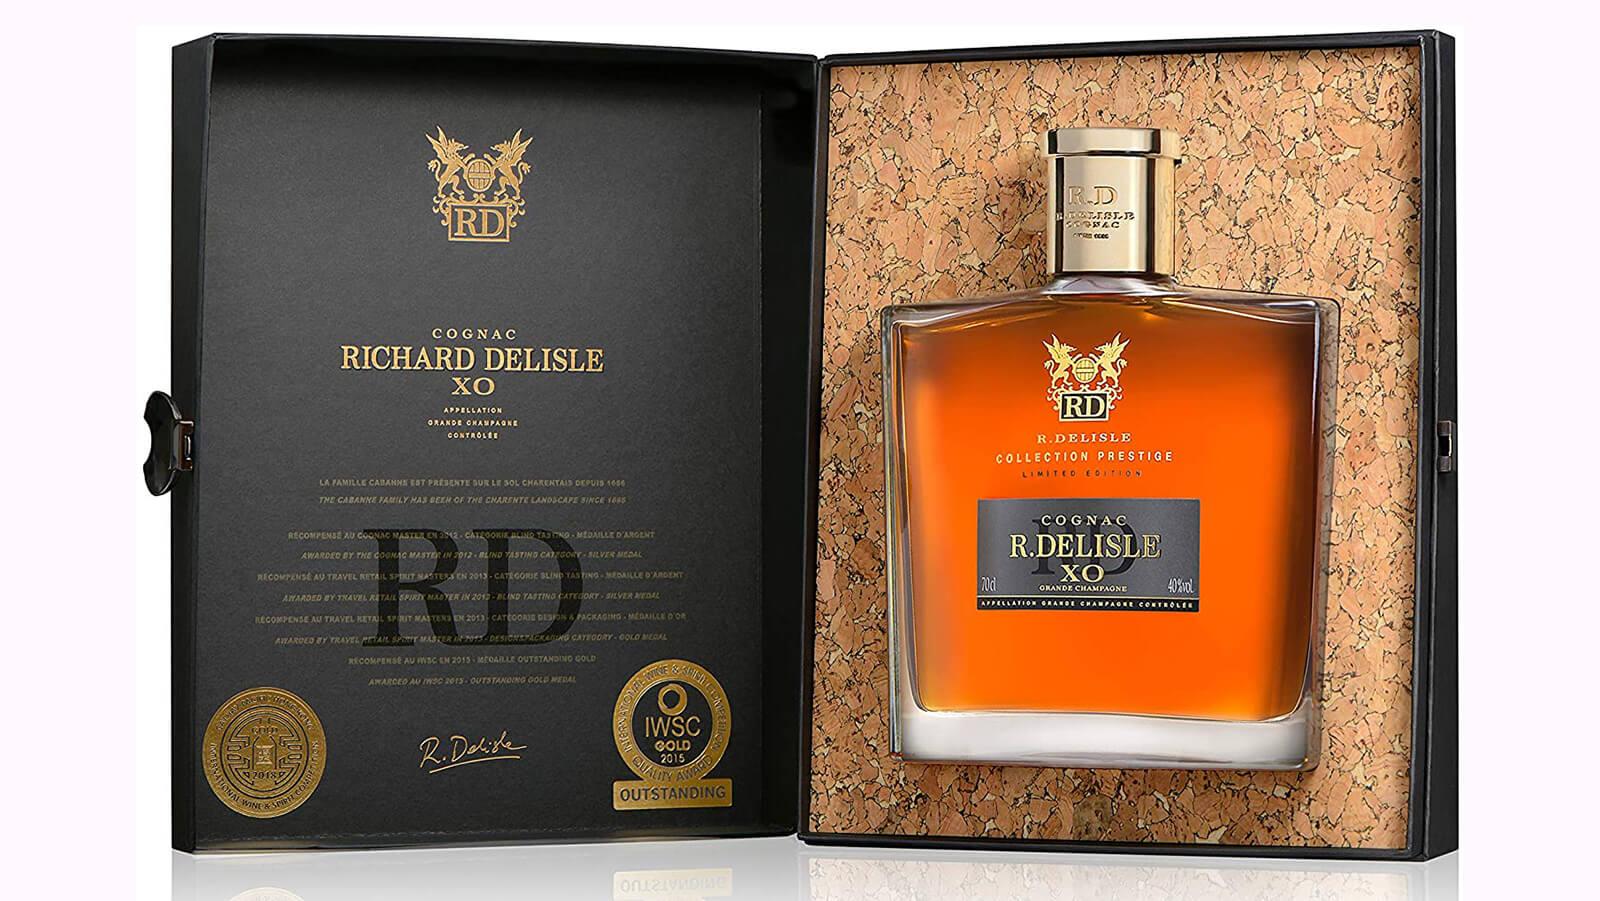 Richard Delisle XO Grande Champagne